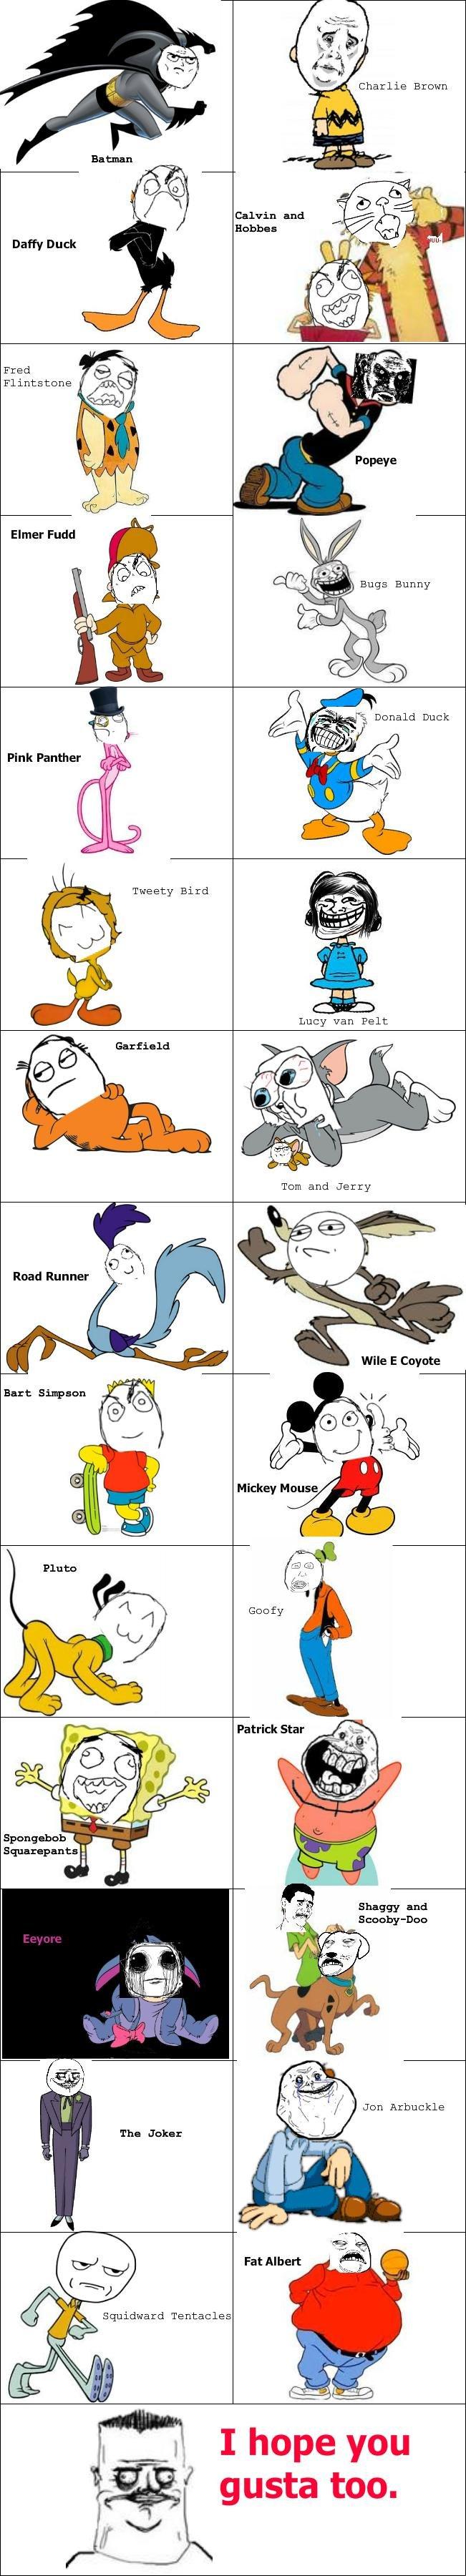 Rage Equivalents. Credit to Reddit: i.imgur.com/SJgkv.jpg. Flintstone r Elmer Fudd Pink Panther meaty Bird nad Road Runner Spanglish Shaggy and Thu Jan:. tweety bird is a guy.